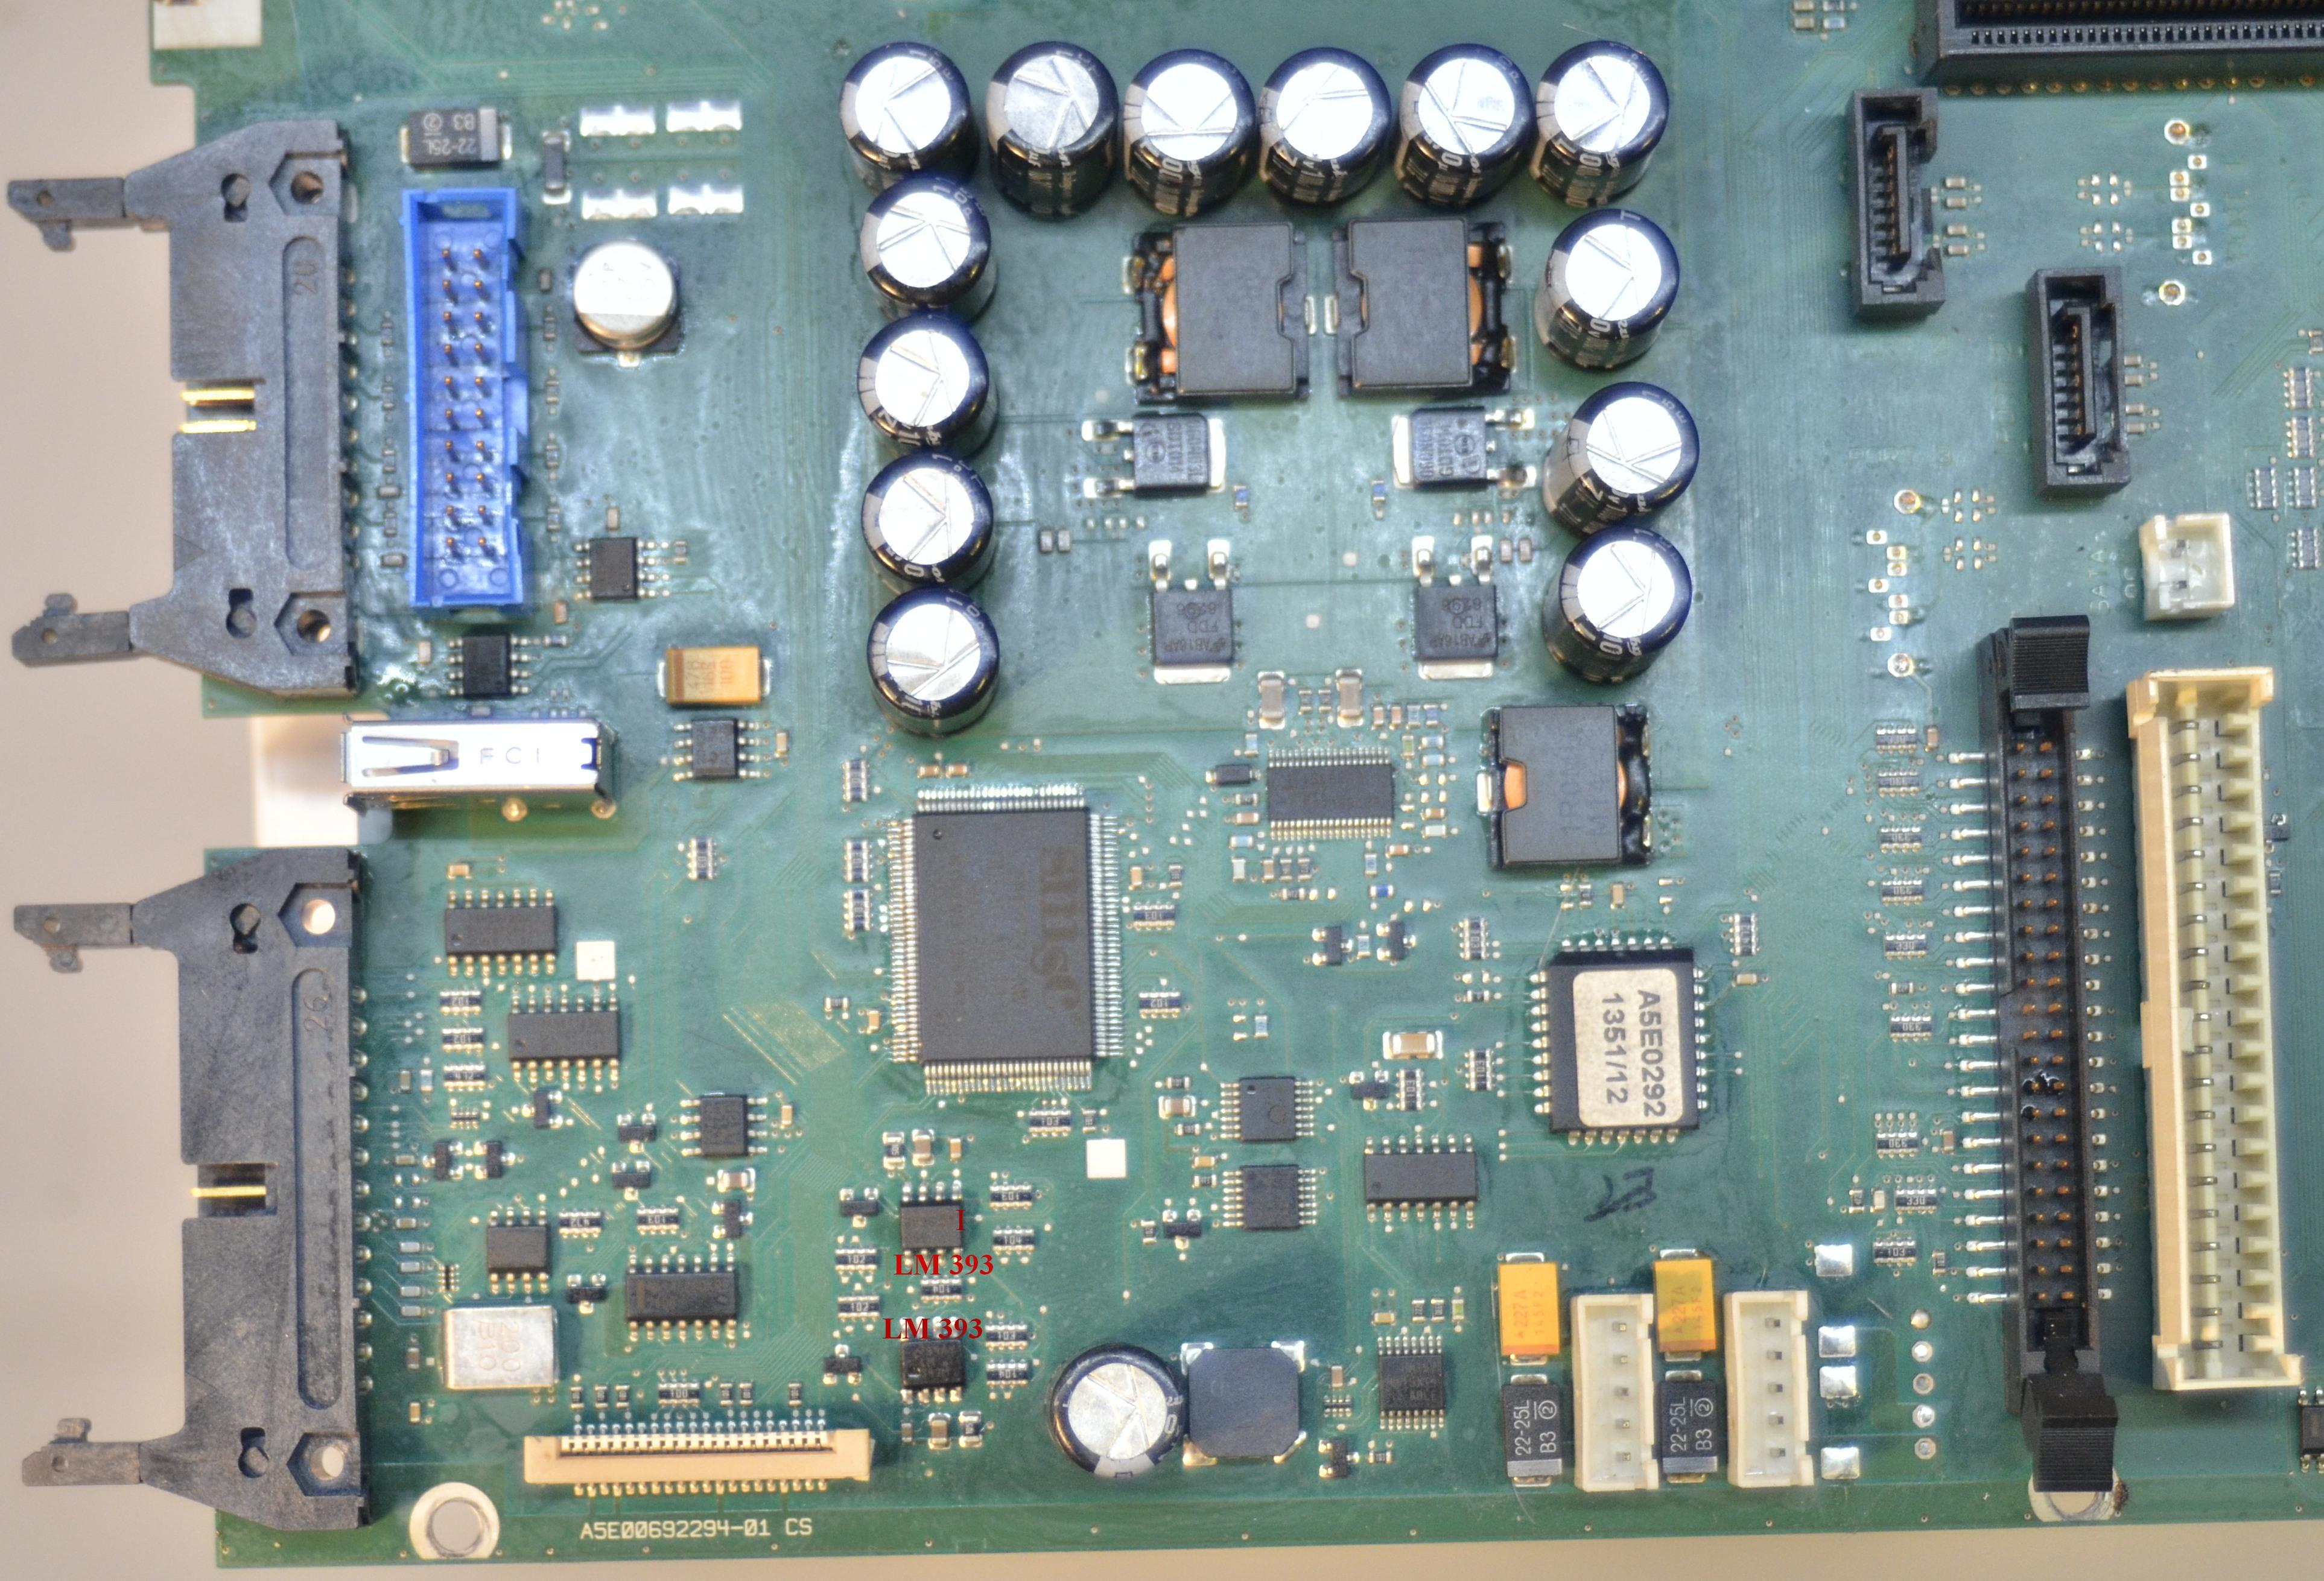 Siemens Sinumerik PCU 50.3-P Typ: 6FC5210-0DF33-2AA0 Repair fix Price